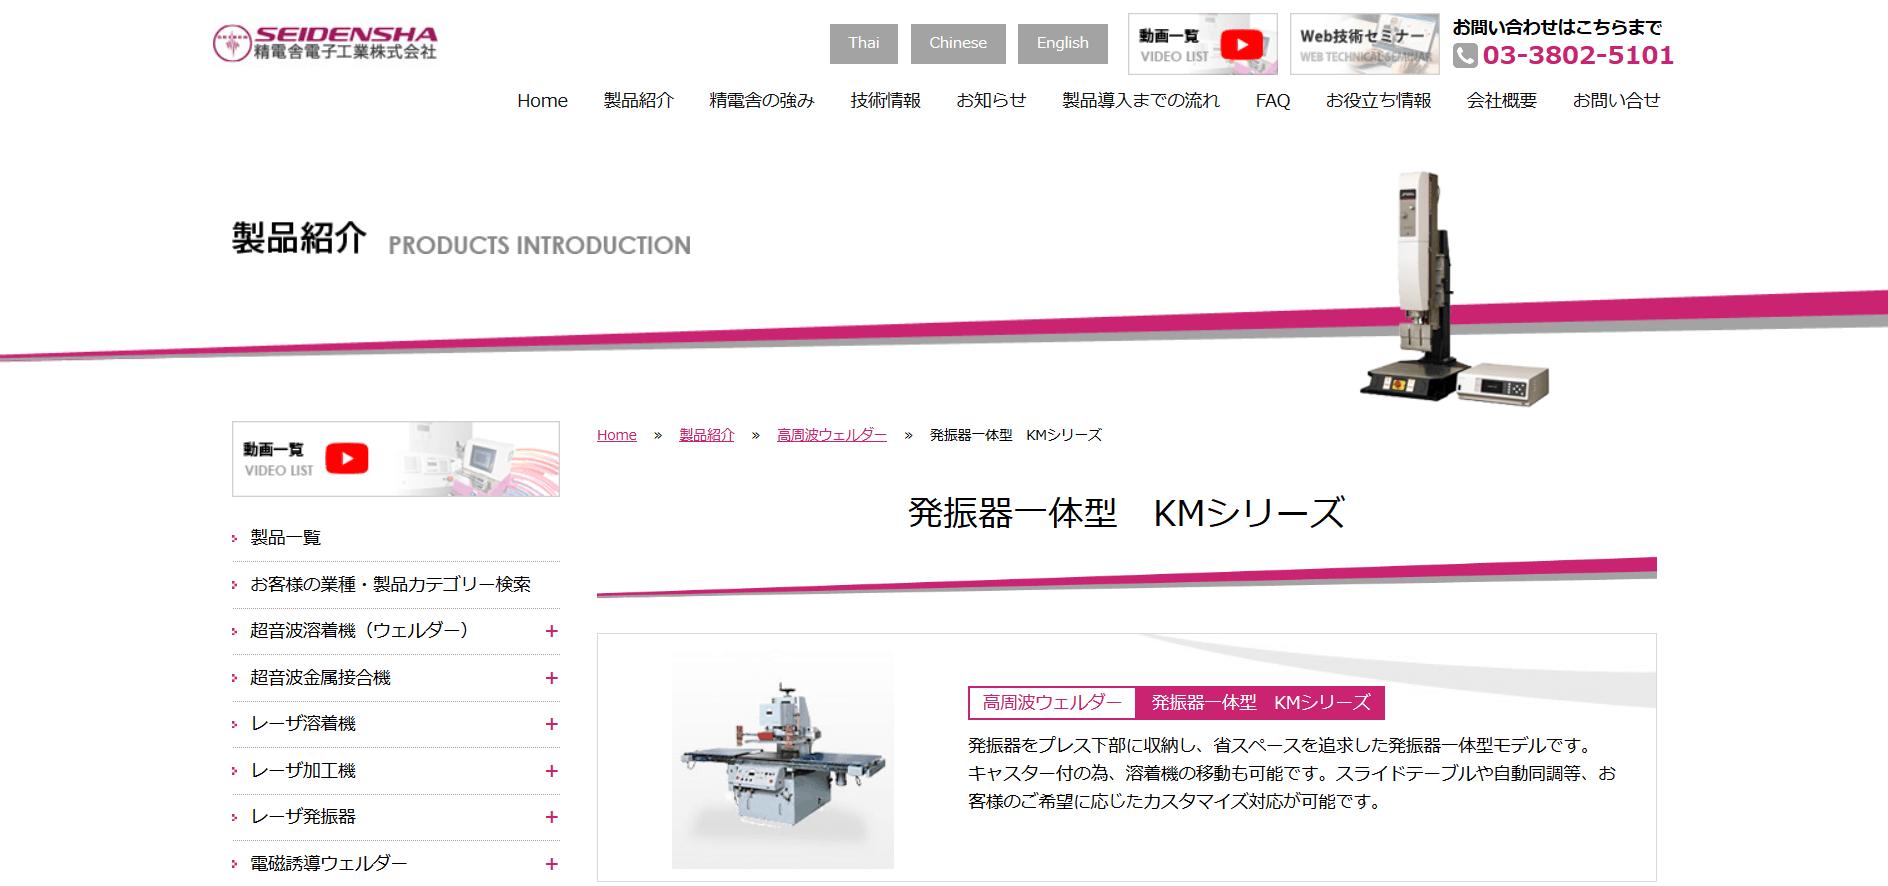 発振器一体型 KMシリーズ